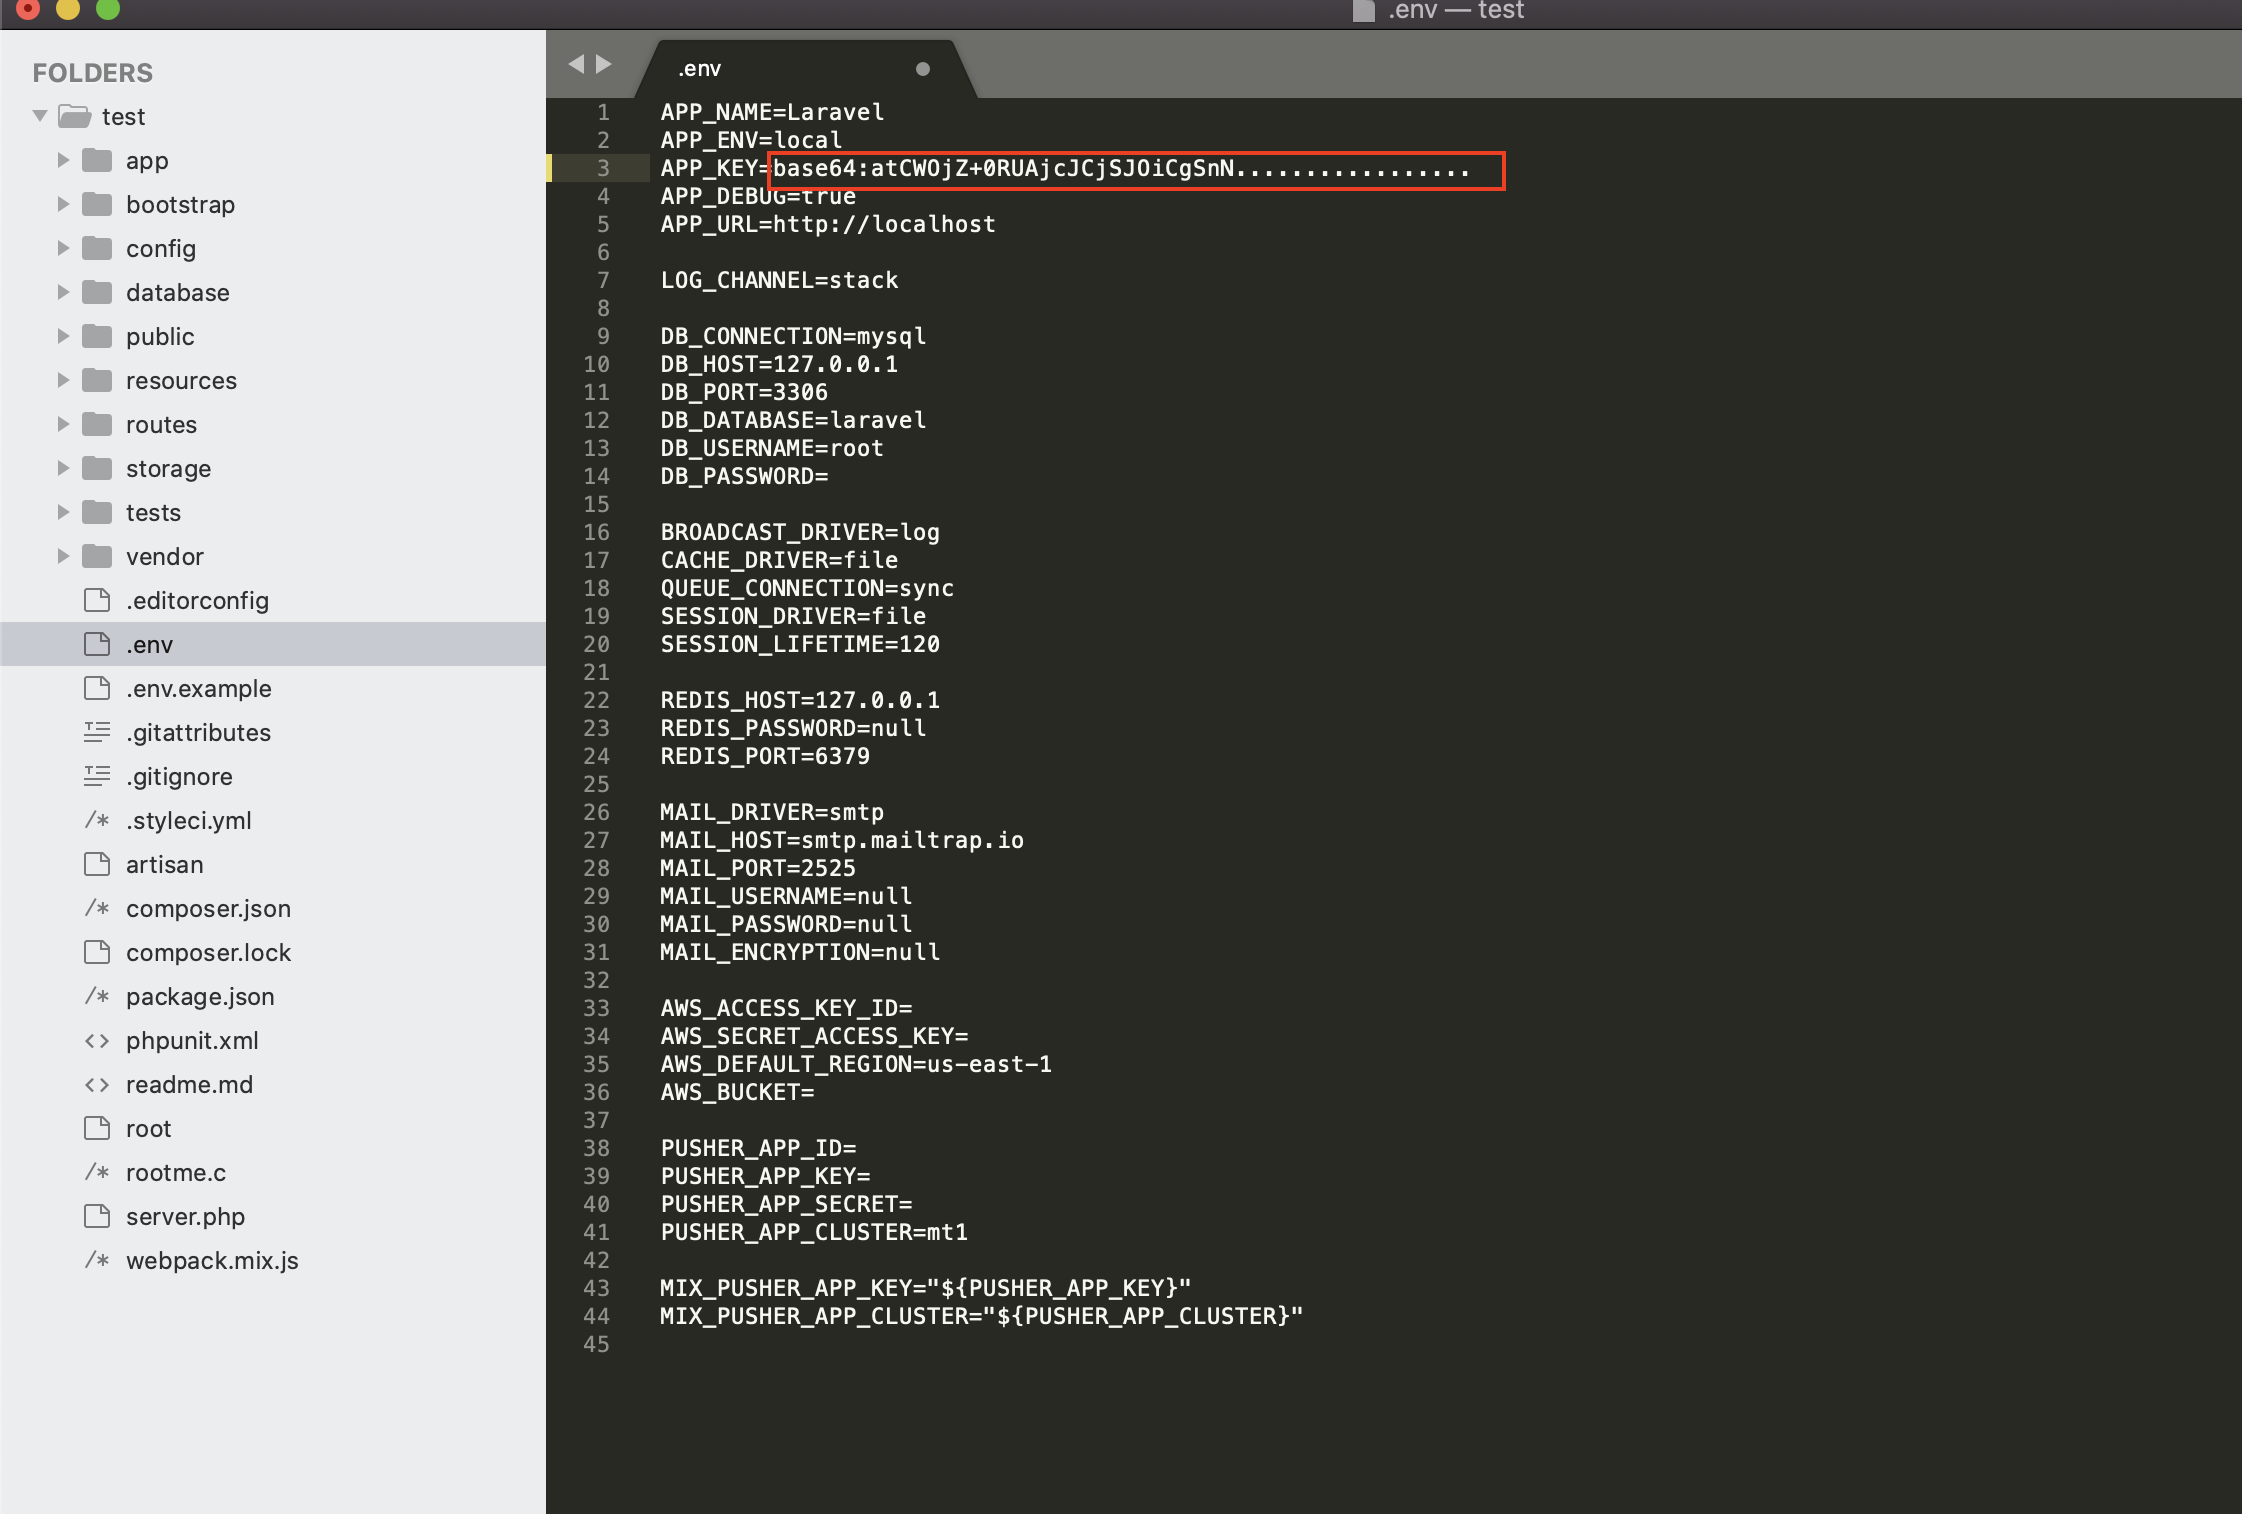 https://manhnv.com/images/posts/hacking/chi-mot-buoi-chieu-toi-da-chiem-quyen-dieu-khien-server-cua-8-website-nhu-the-nao/Screen_Shot_2021-01-14_at_19.08.32.png